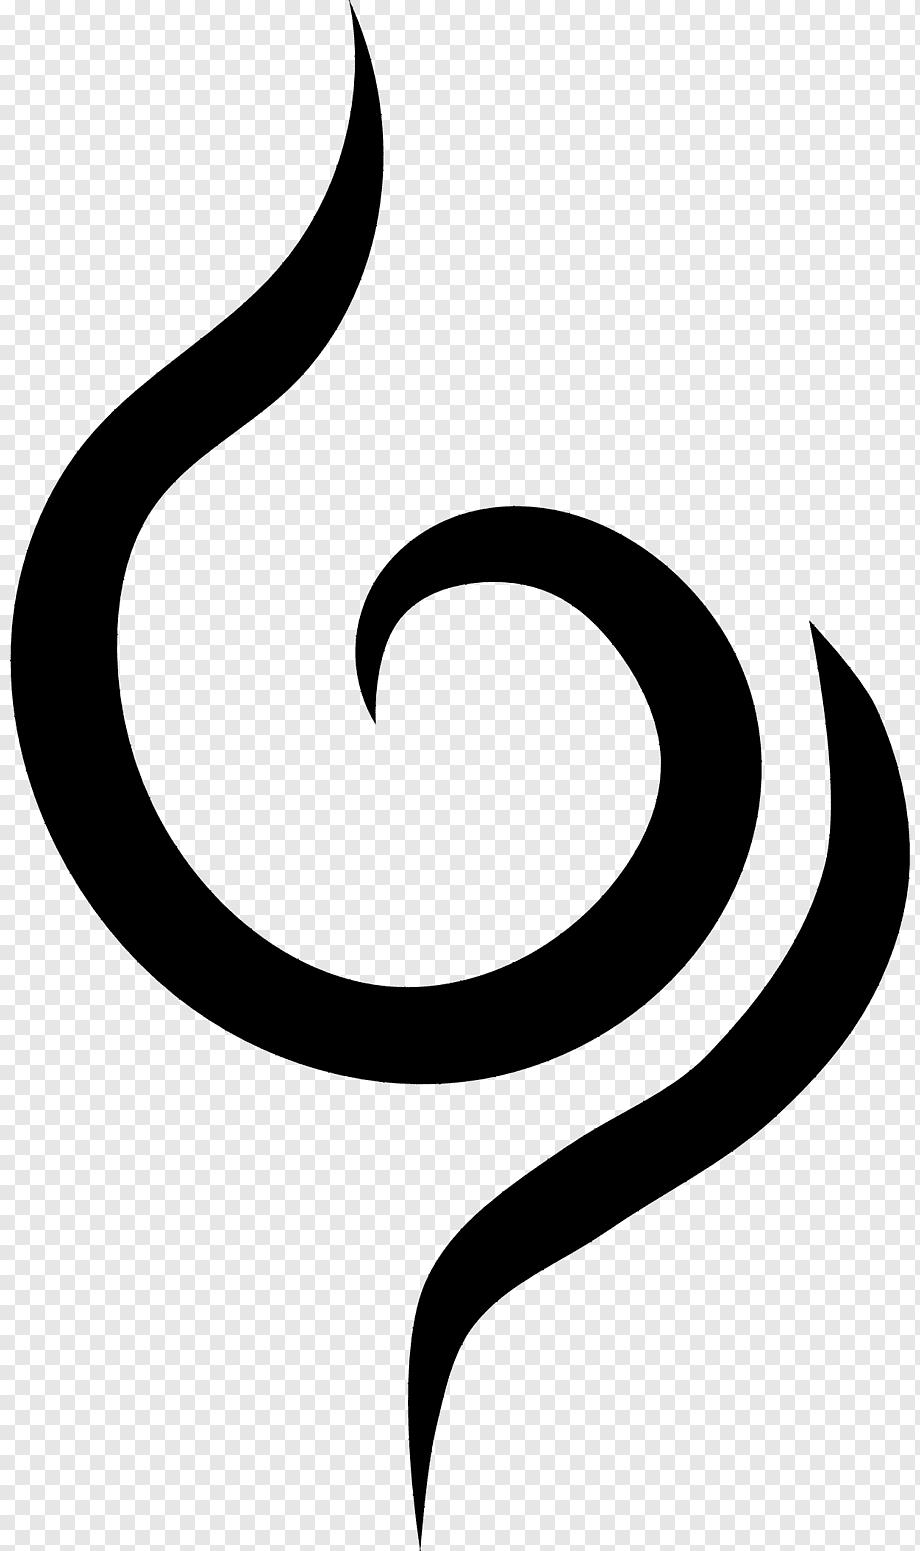 Kakashi Anbu Tattoo : kakashi, tattoo, Black, Tattoo, Kakashi, Hatake,, Others,, Leaf,, Text,, Monochrome, PNGWing